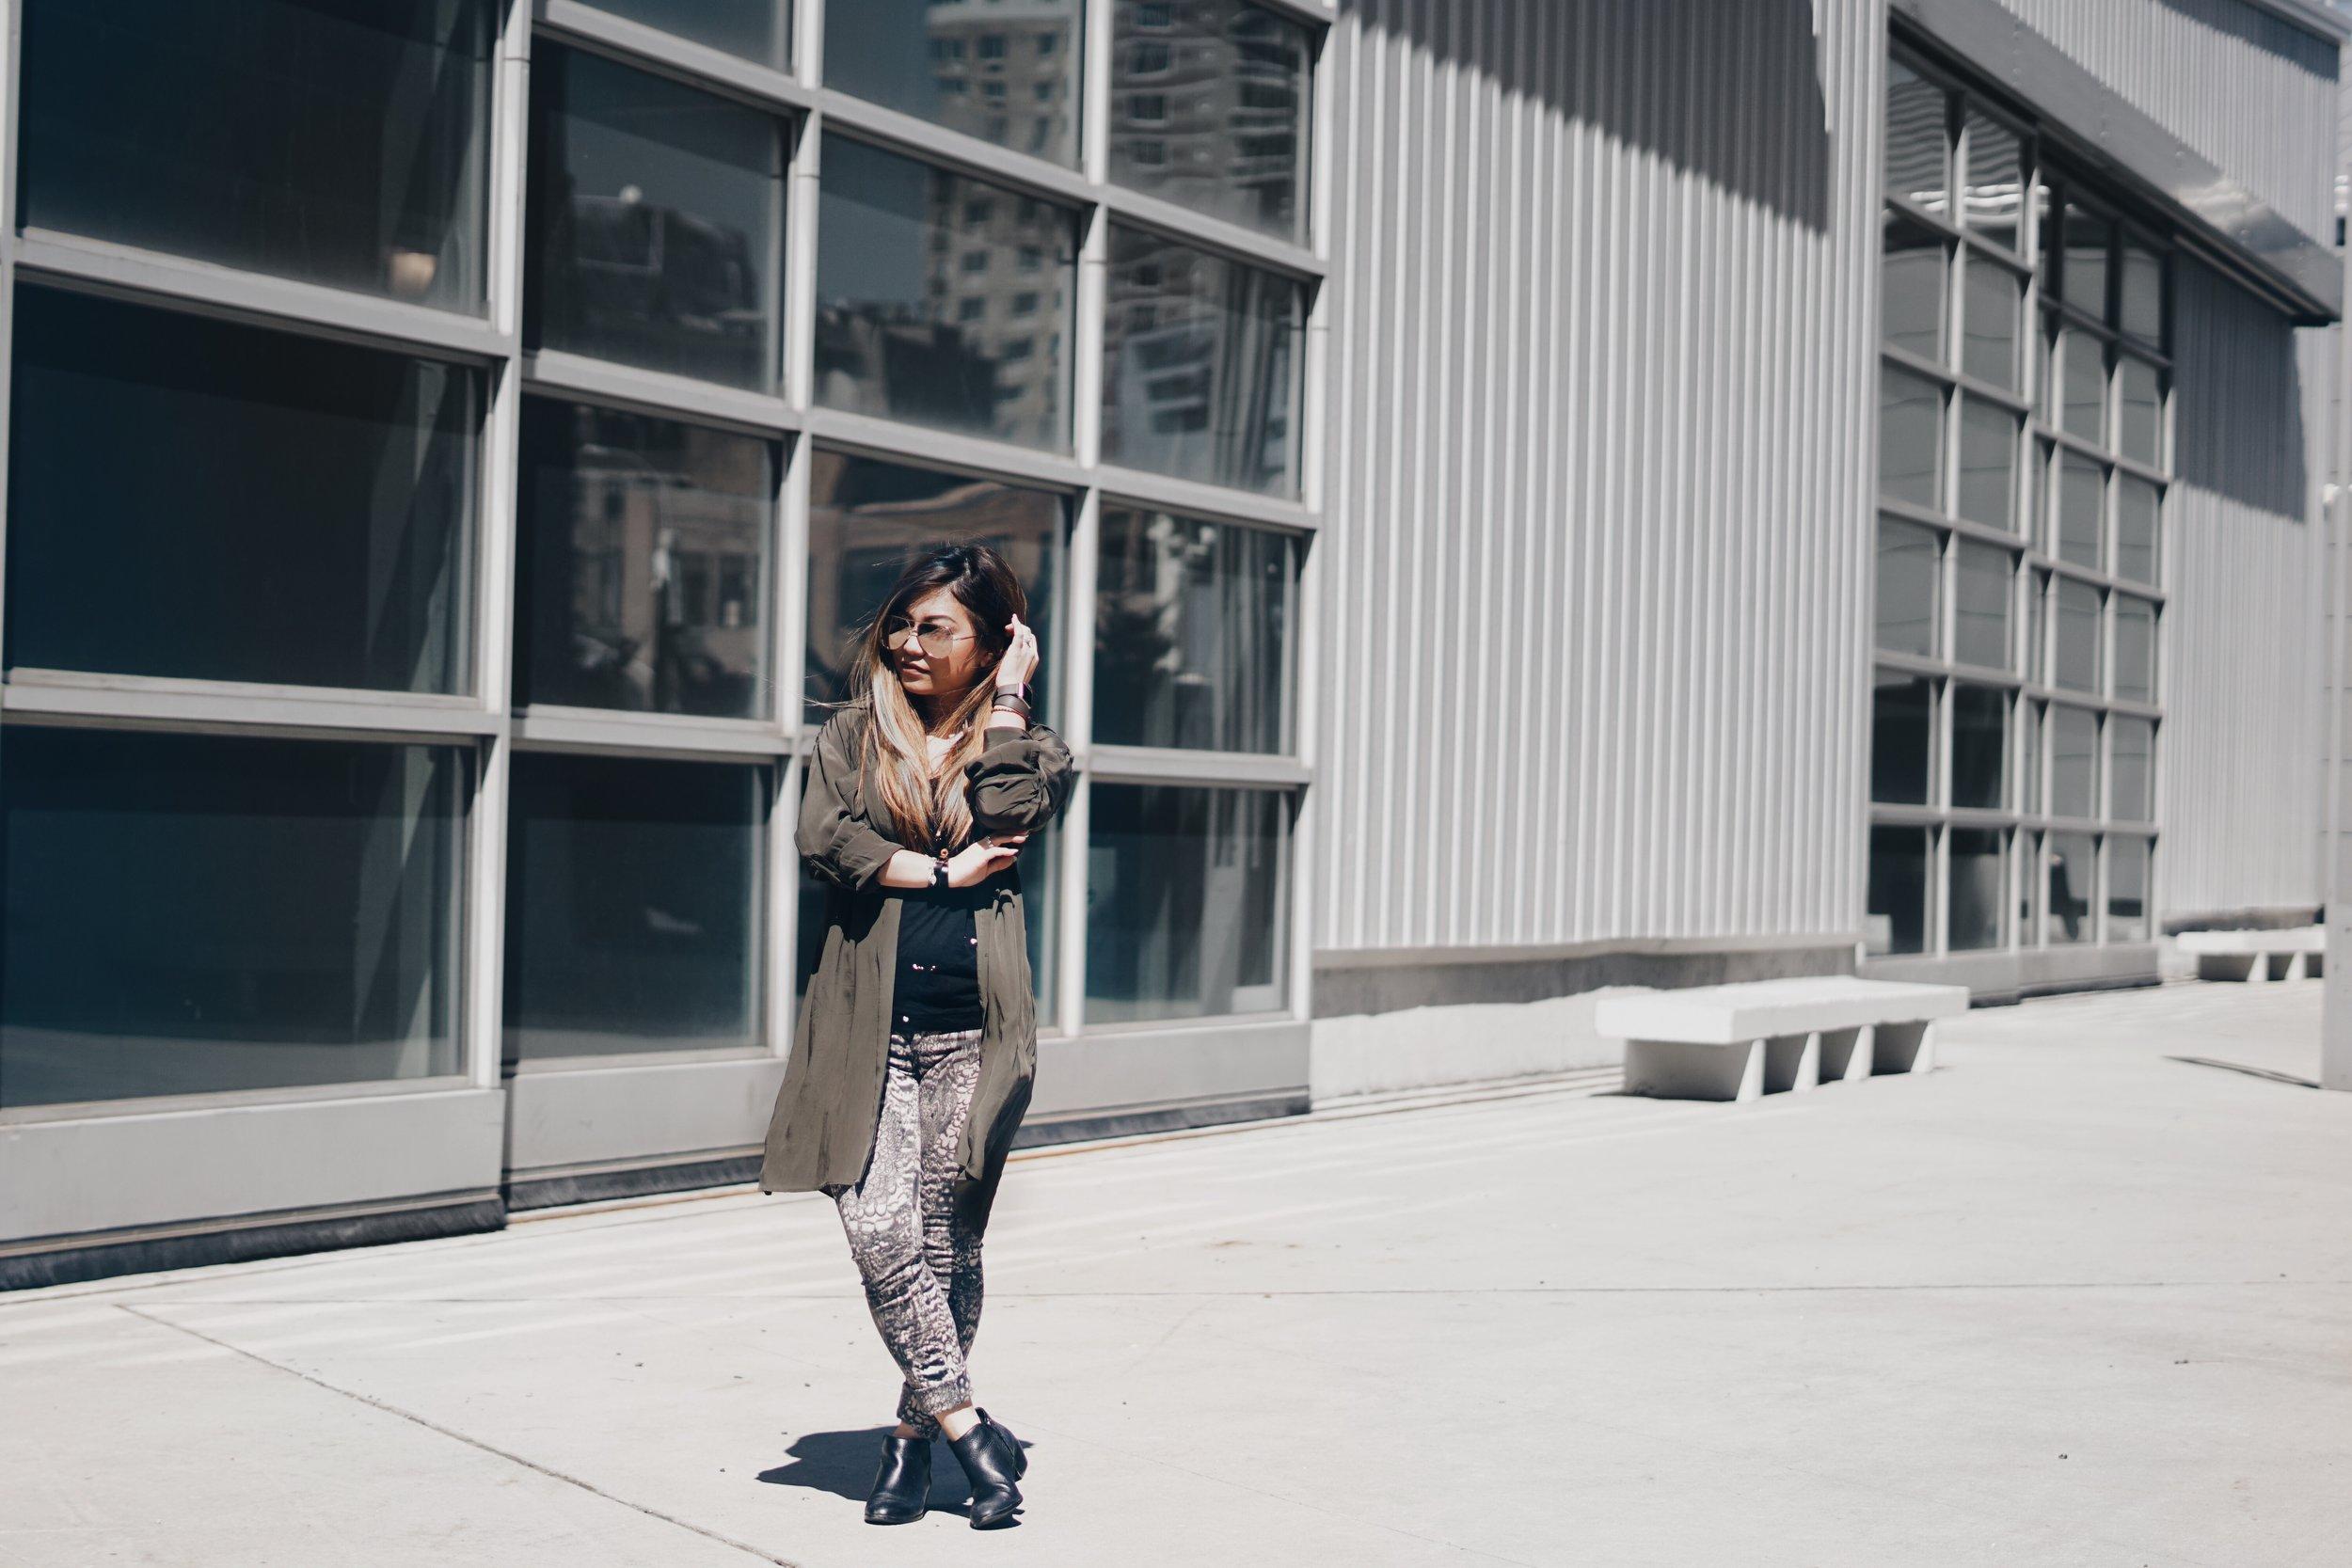 Dress (Worn as Duster):  Chelsea Flower  | Tank: Rag & Bone |Jeans: Rag & Bone | Booties: Sam Edelman | Sunglasses: Quay Australia | Jewelry & Watch: Hermes